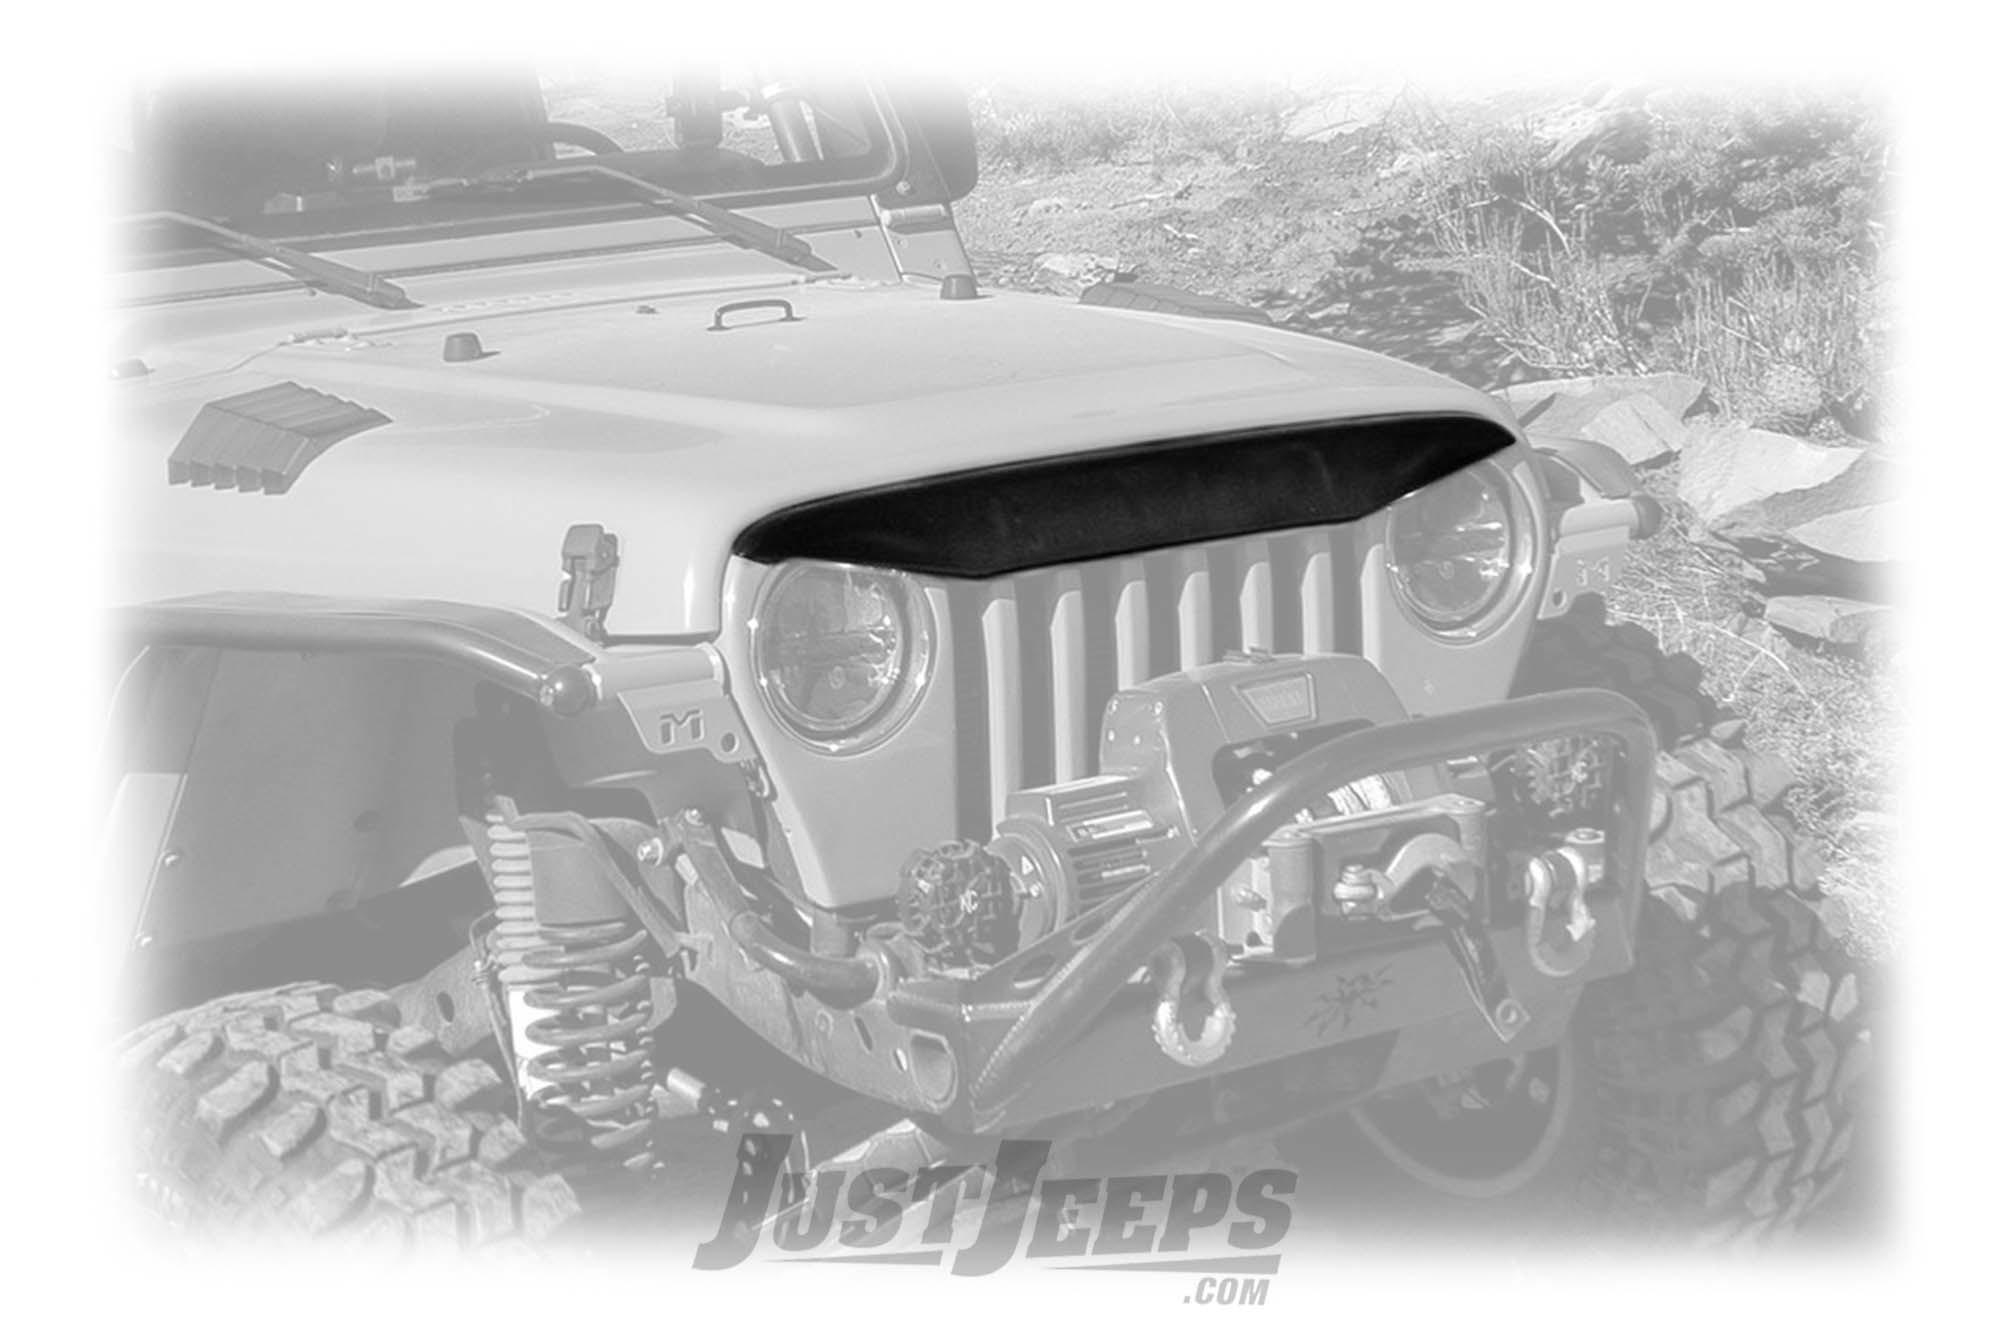 Daystar Angry Eyebrow For 1997-06 Jeep Wrangler TJ & TLJ Unlimited Models KJ73000BK